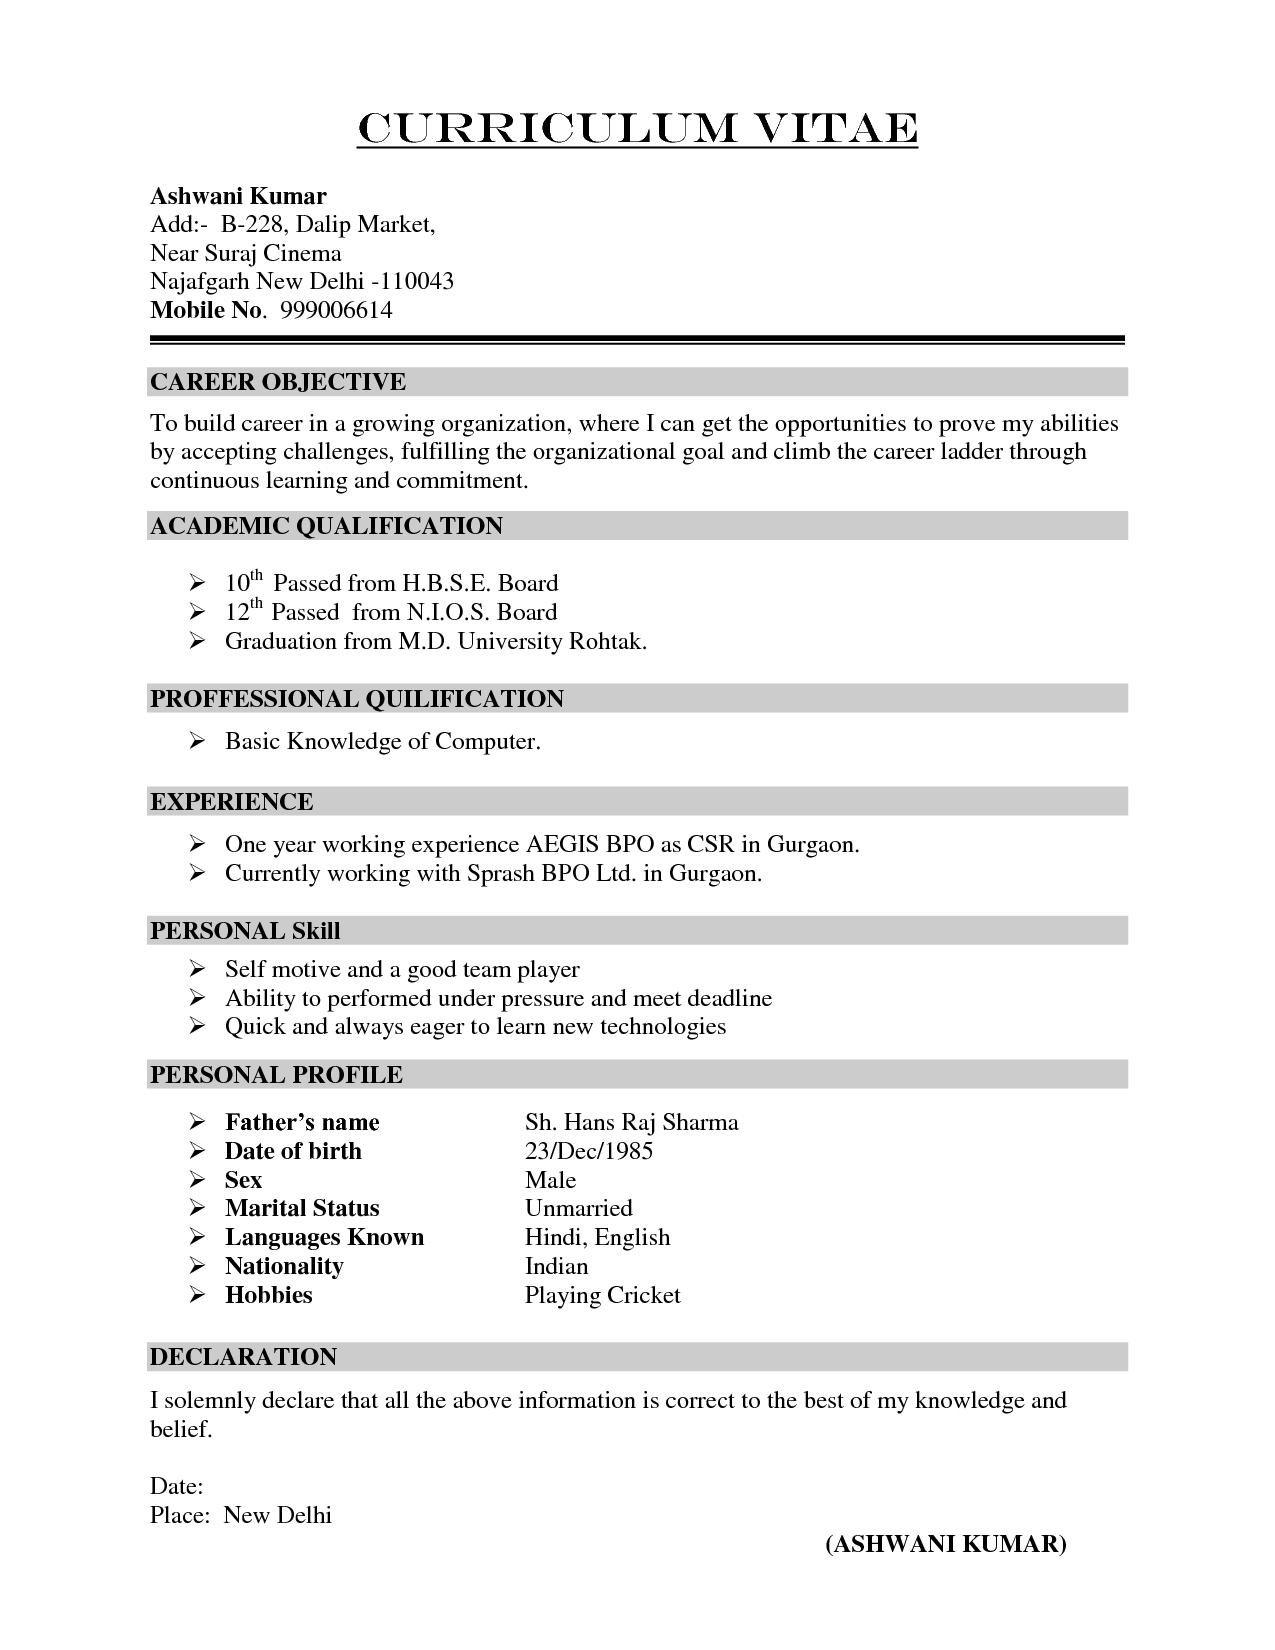 C V Resume Format Format Resume Resume Format Download Best Resume Format Resume Format Free Download